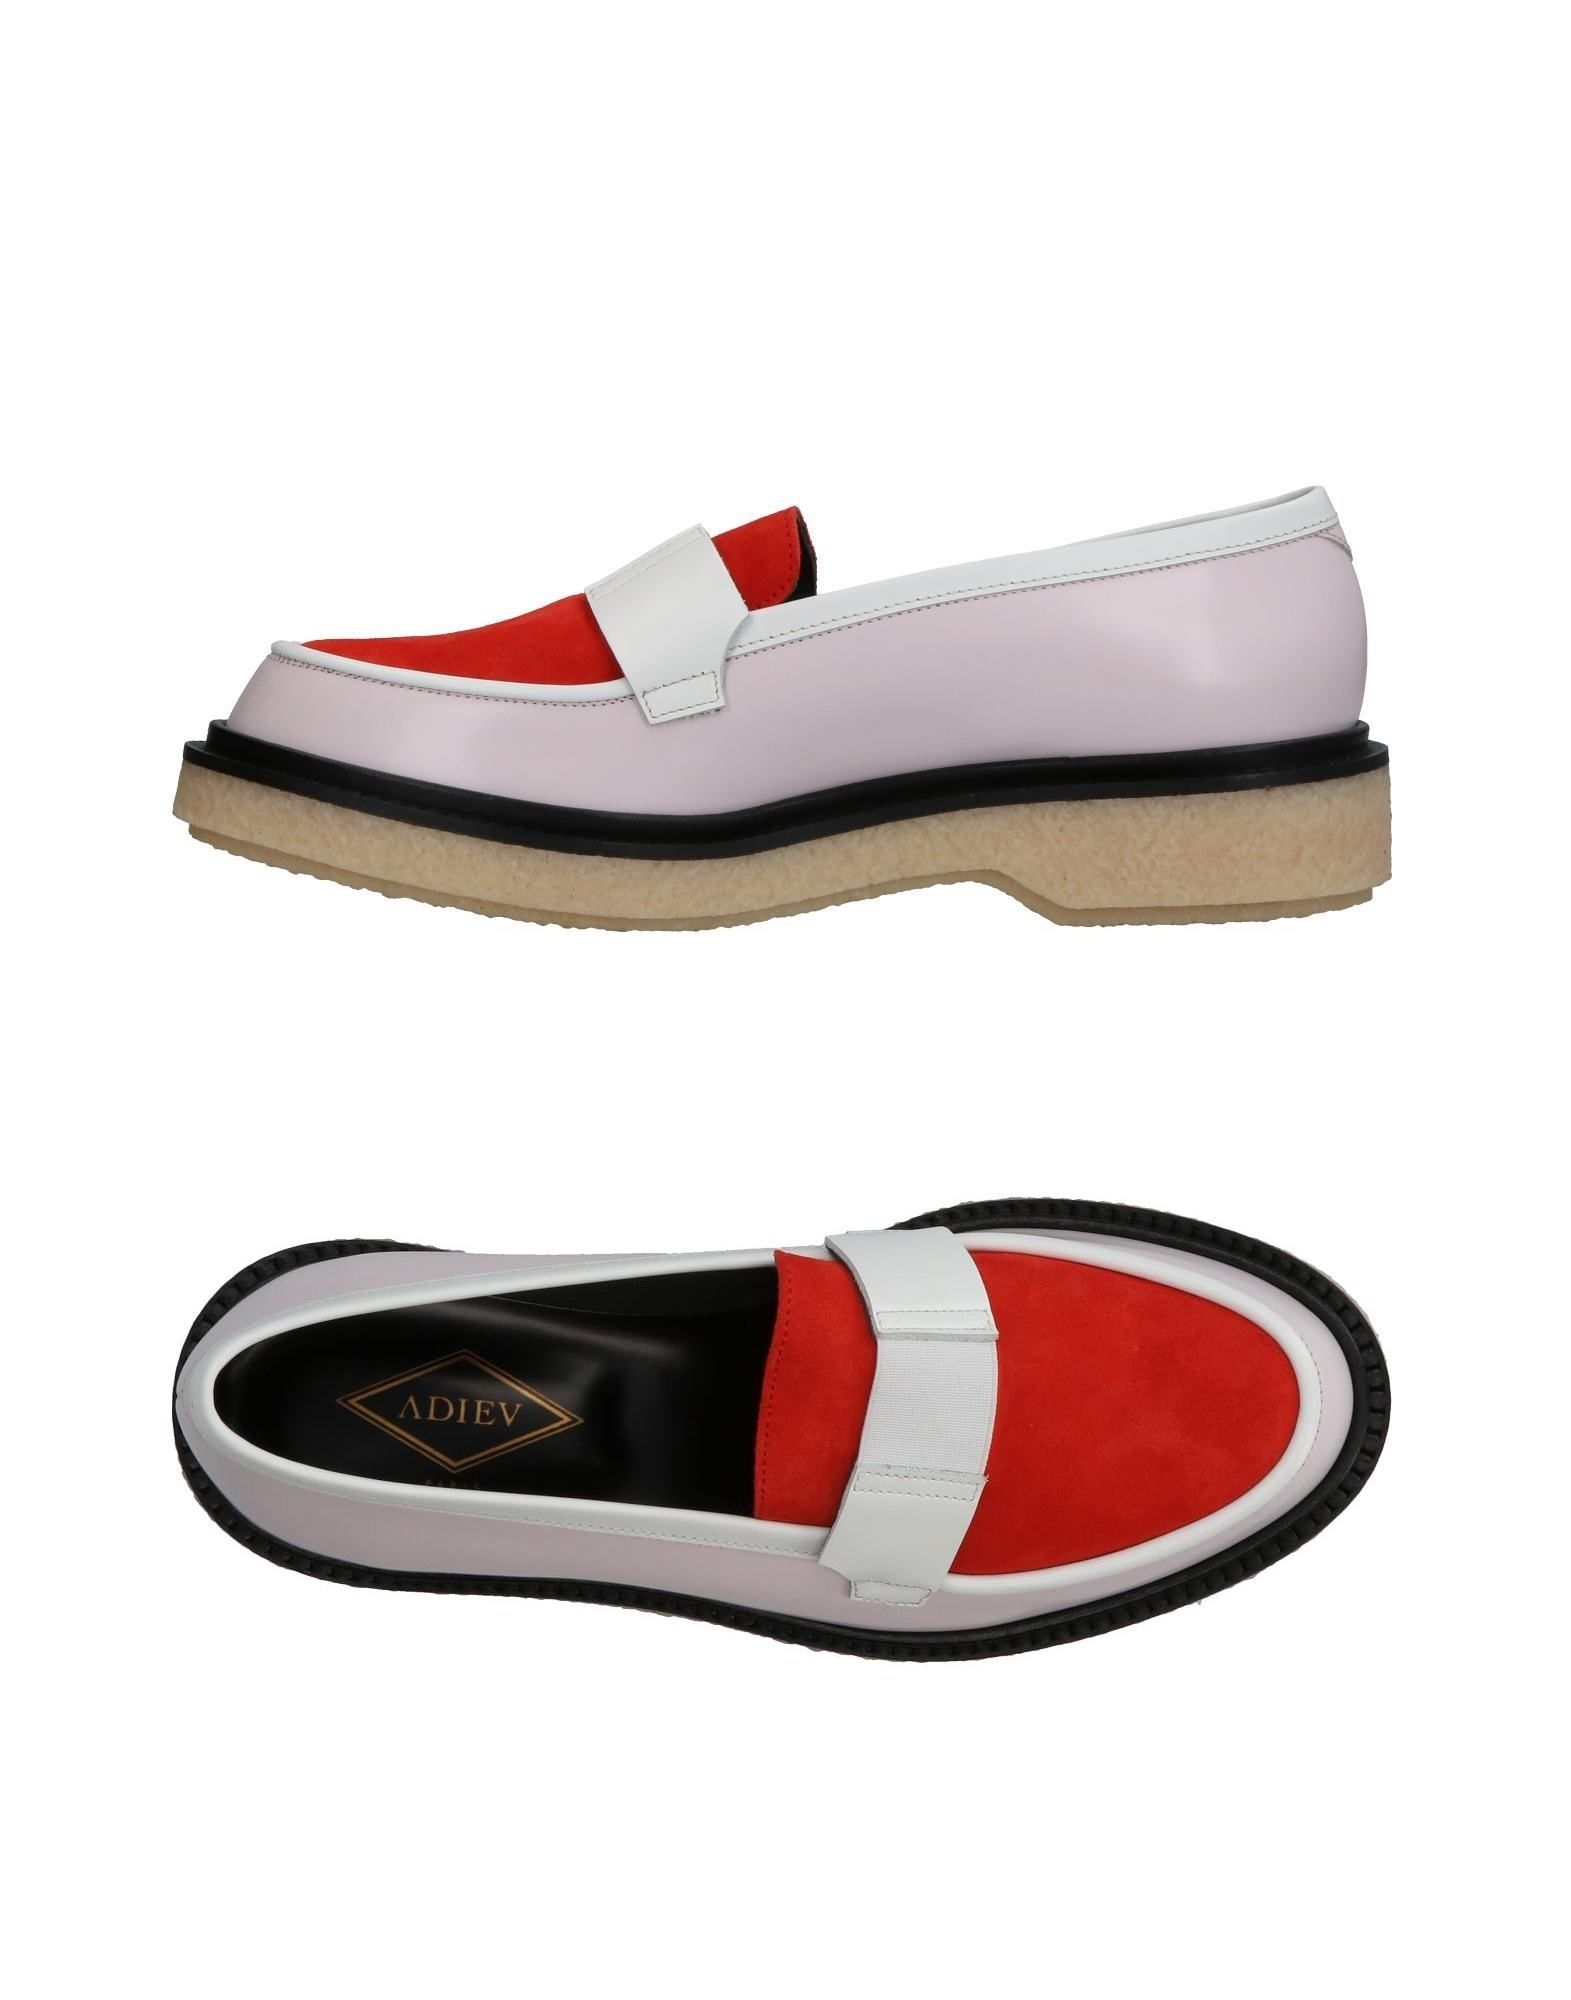 Haltbare Mode billige Schuhe Adieu Mokassins Damen  11345778QO Heiße Heiße 11345778QO Schuhe c6b631